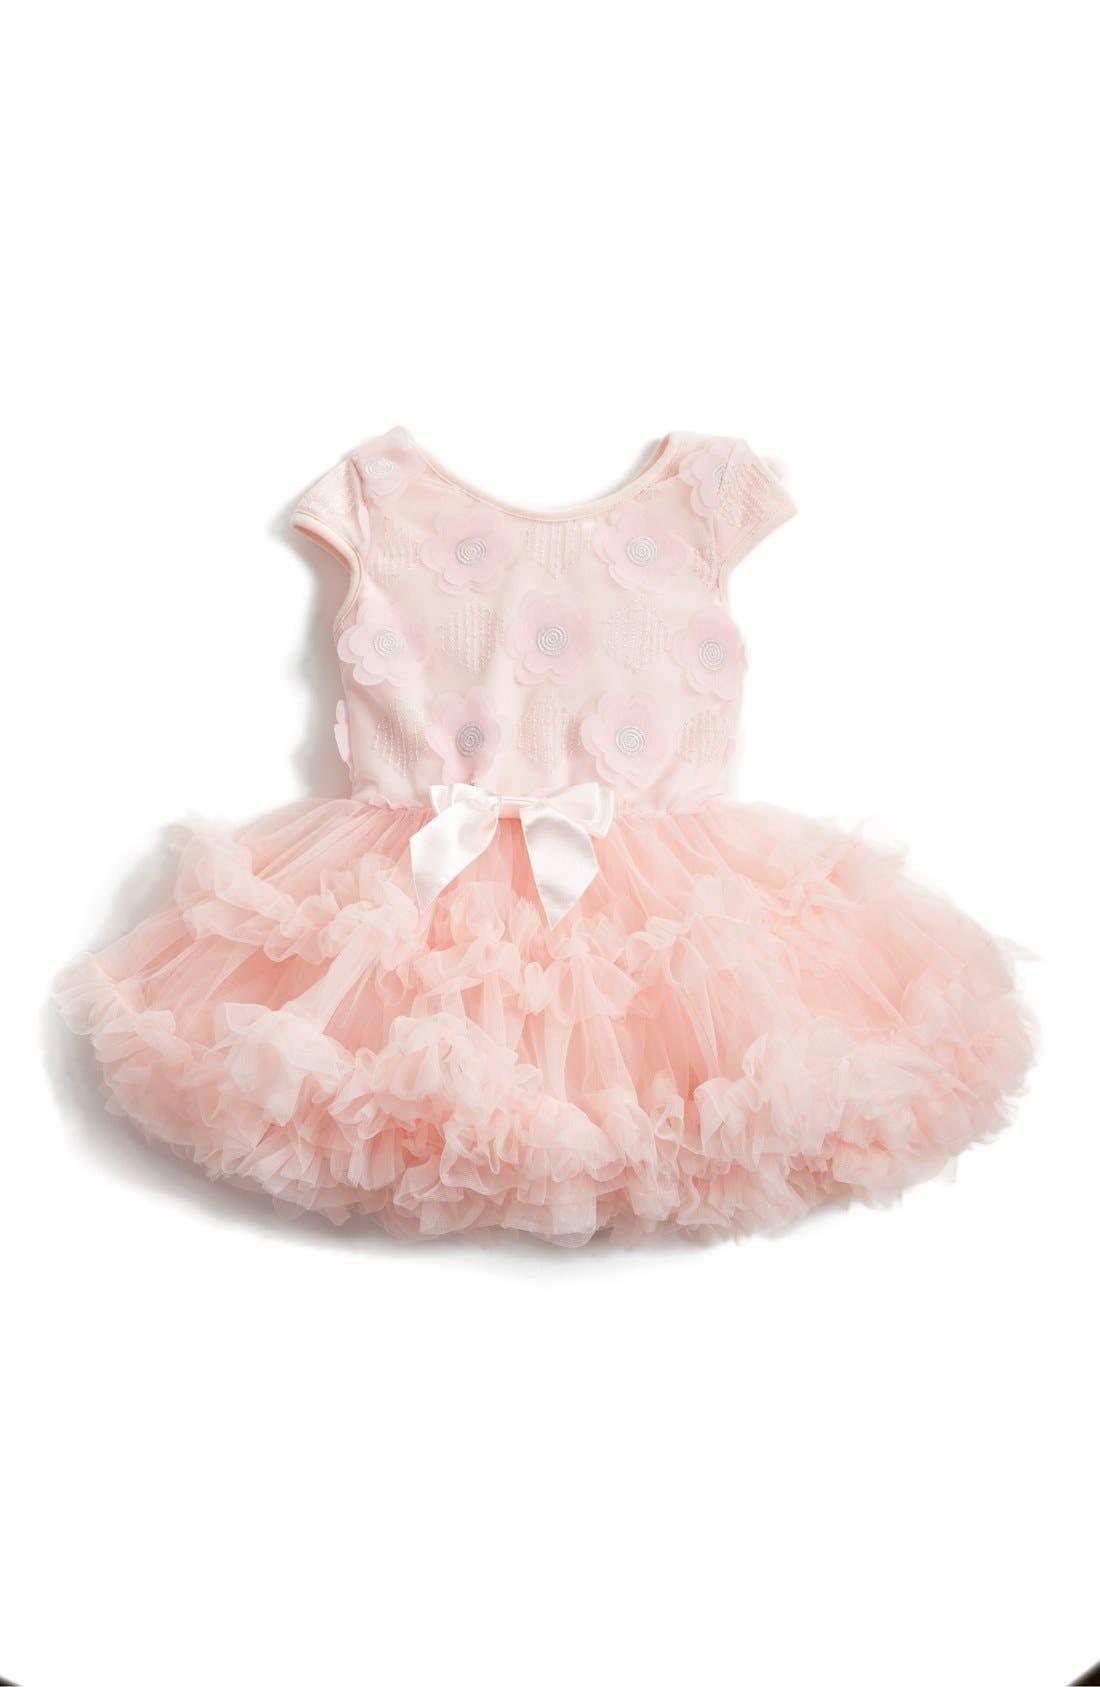 Popatu Embroidered Flower Appliqué Pettidress (Baby Girls)